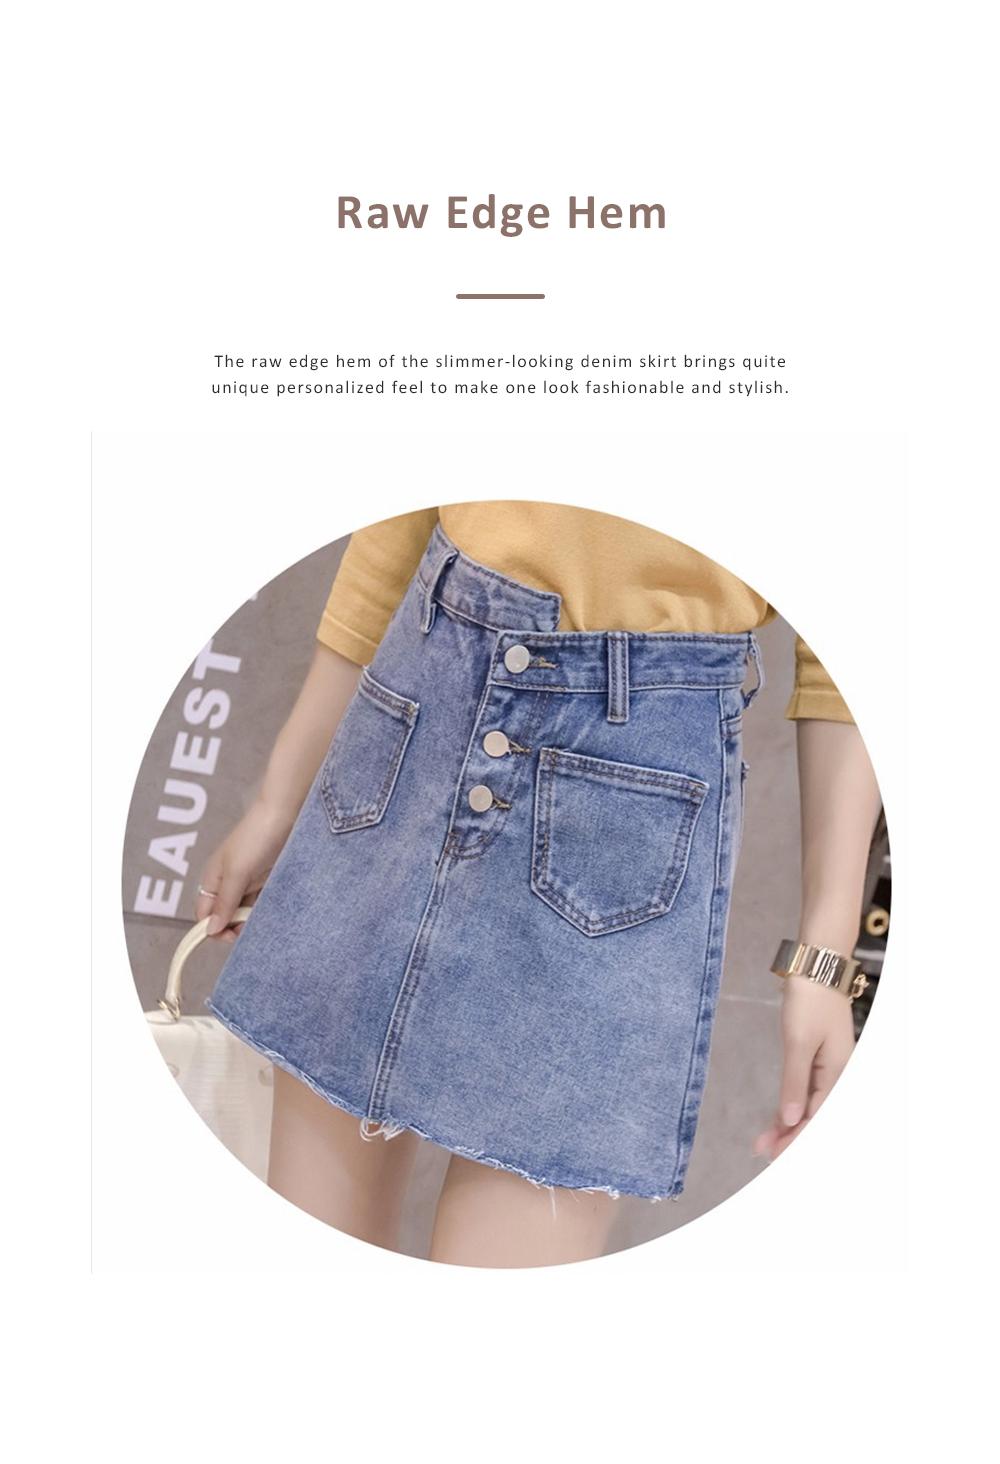 Close-fitting Irregular Denim Skirt for Women in Summer High-waisted Slimmer-looking Sheath Dress Hairy Brim Jean Midskirt Women Dress 3